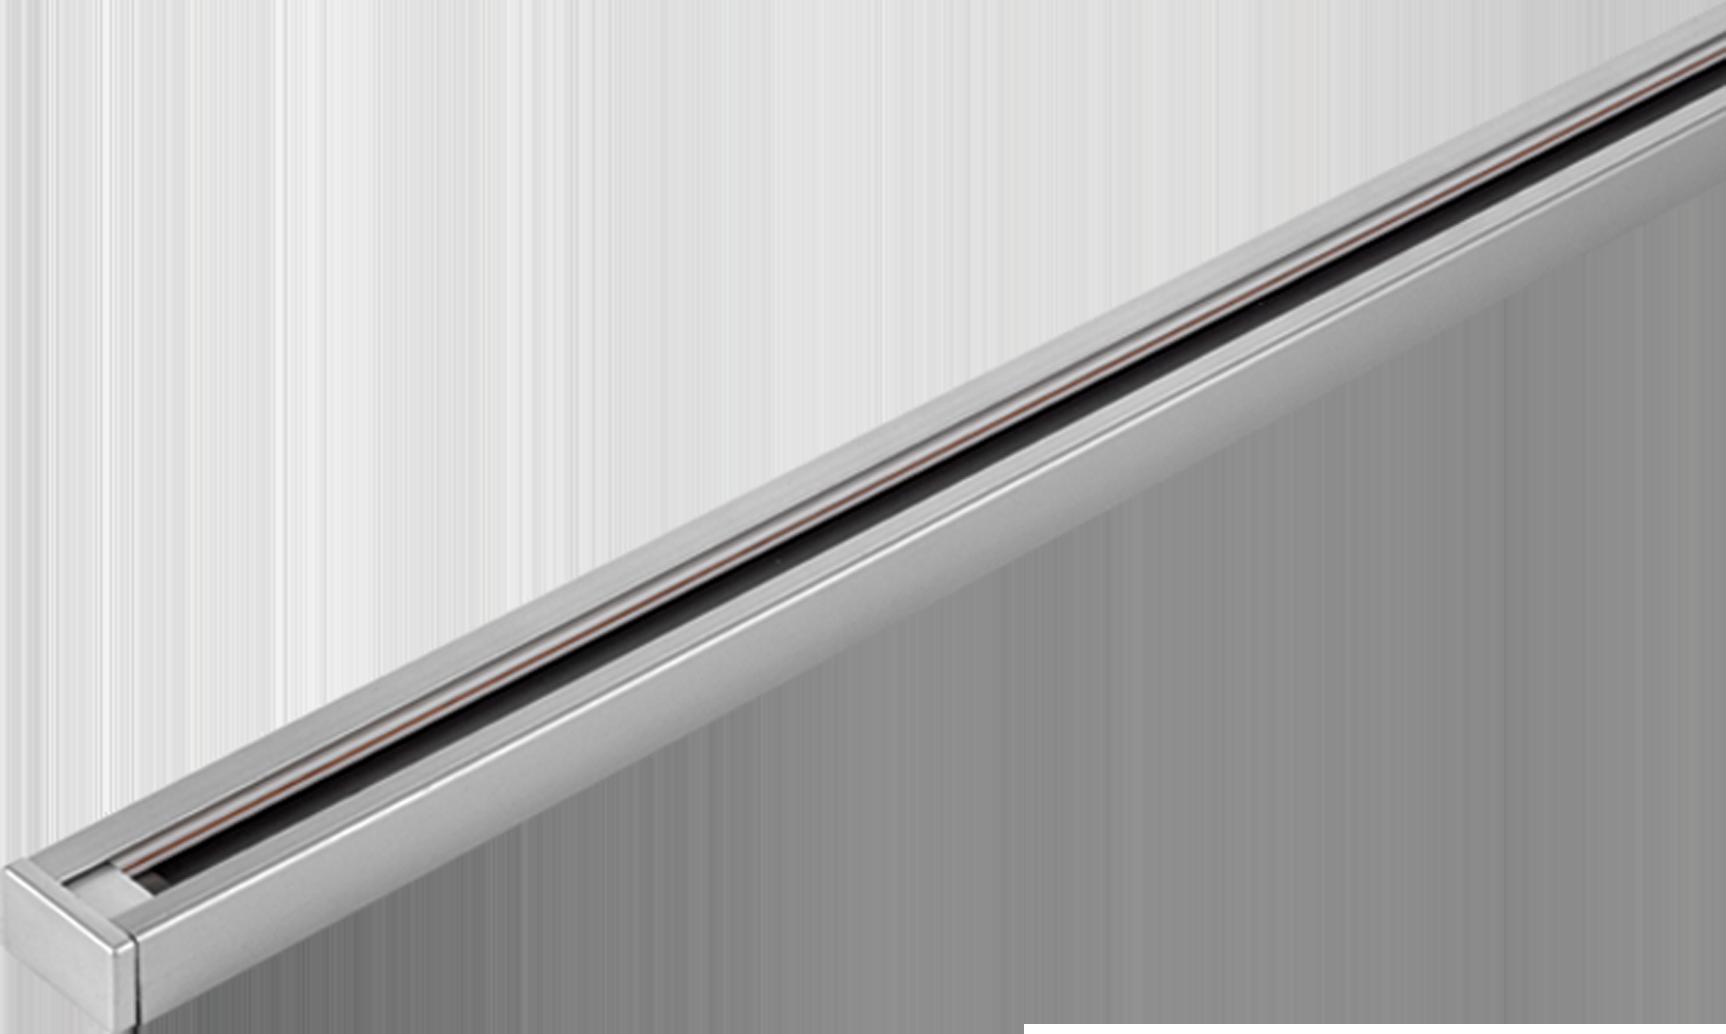 ZE294-1